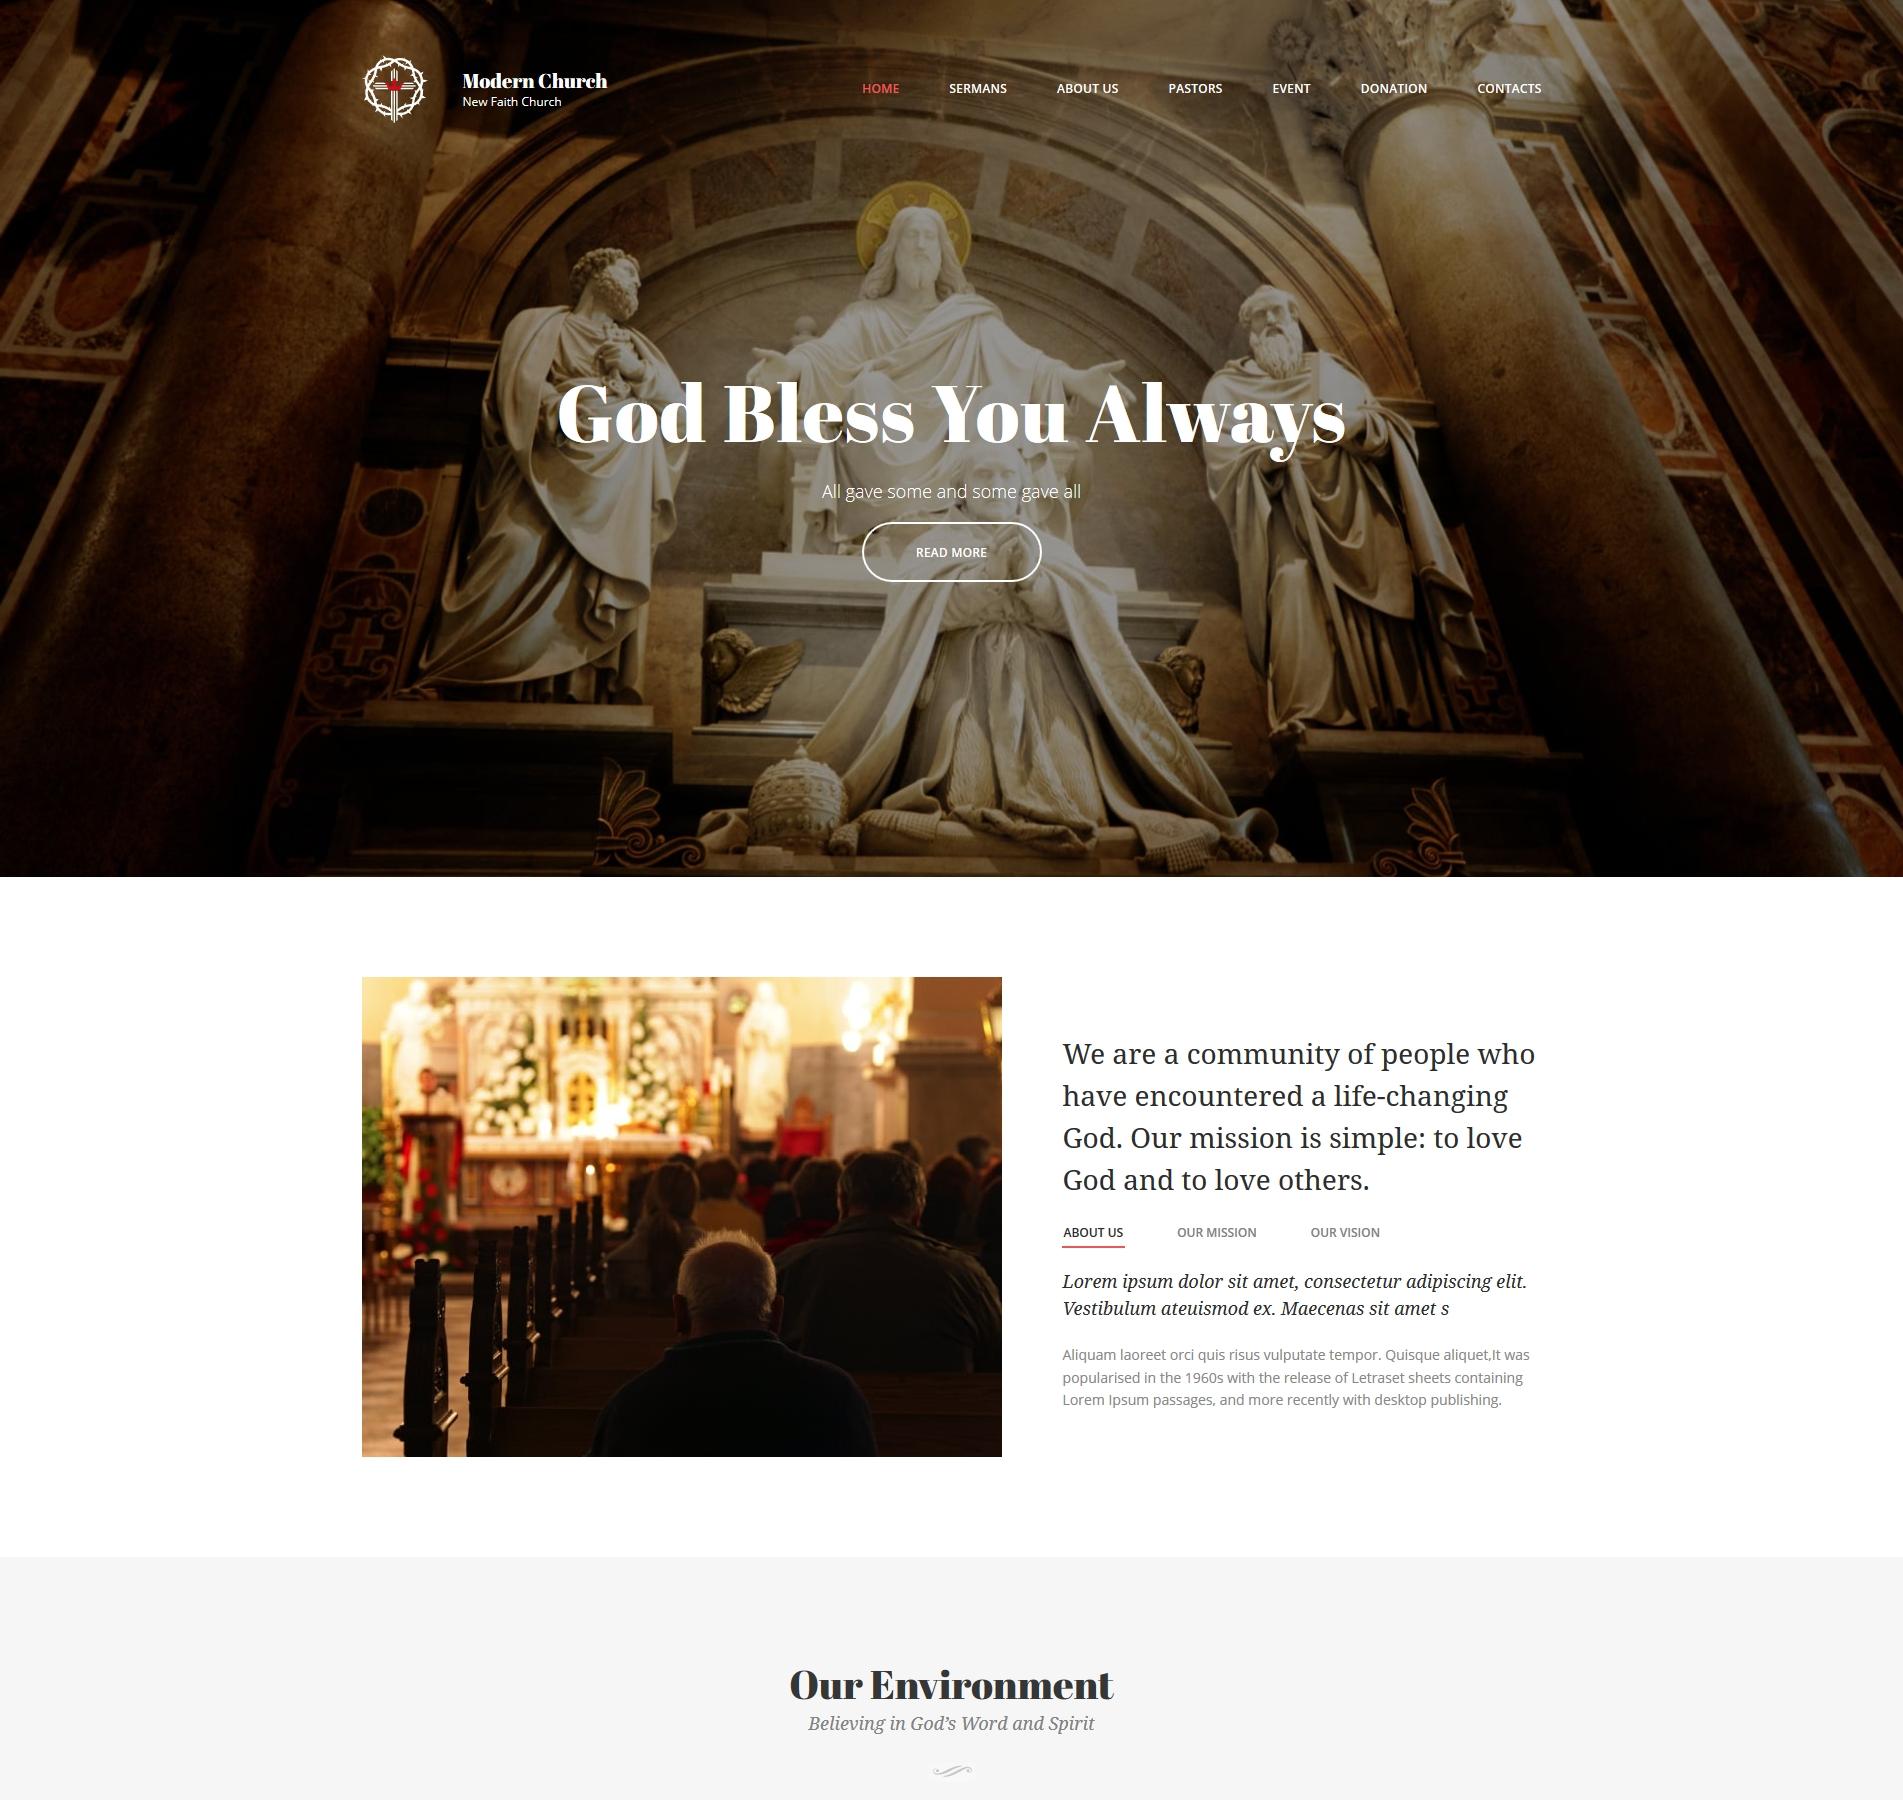 Christian Church Website Design Templatemonster